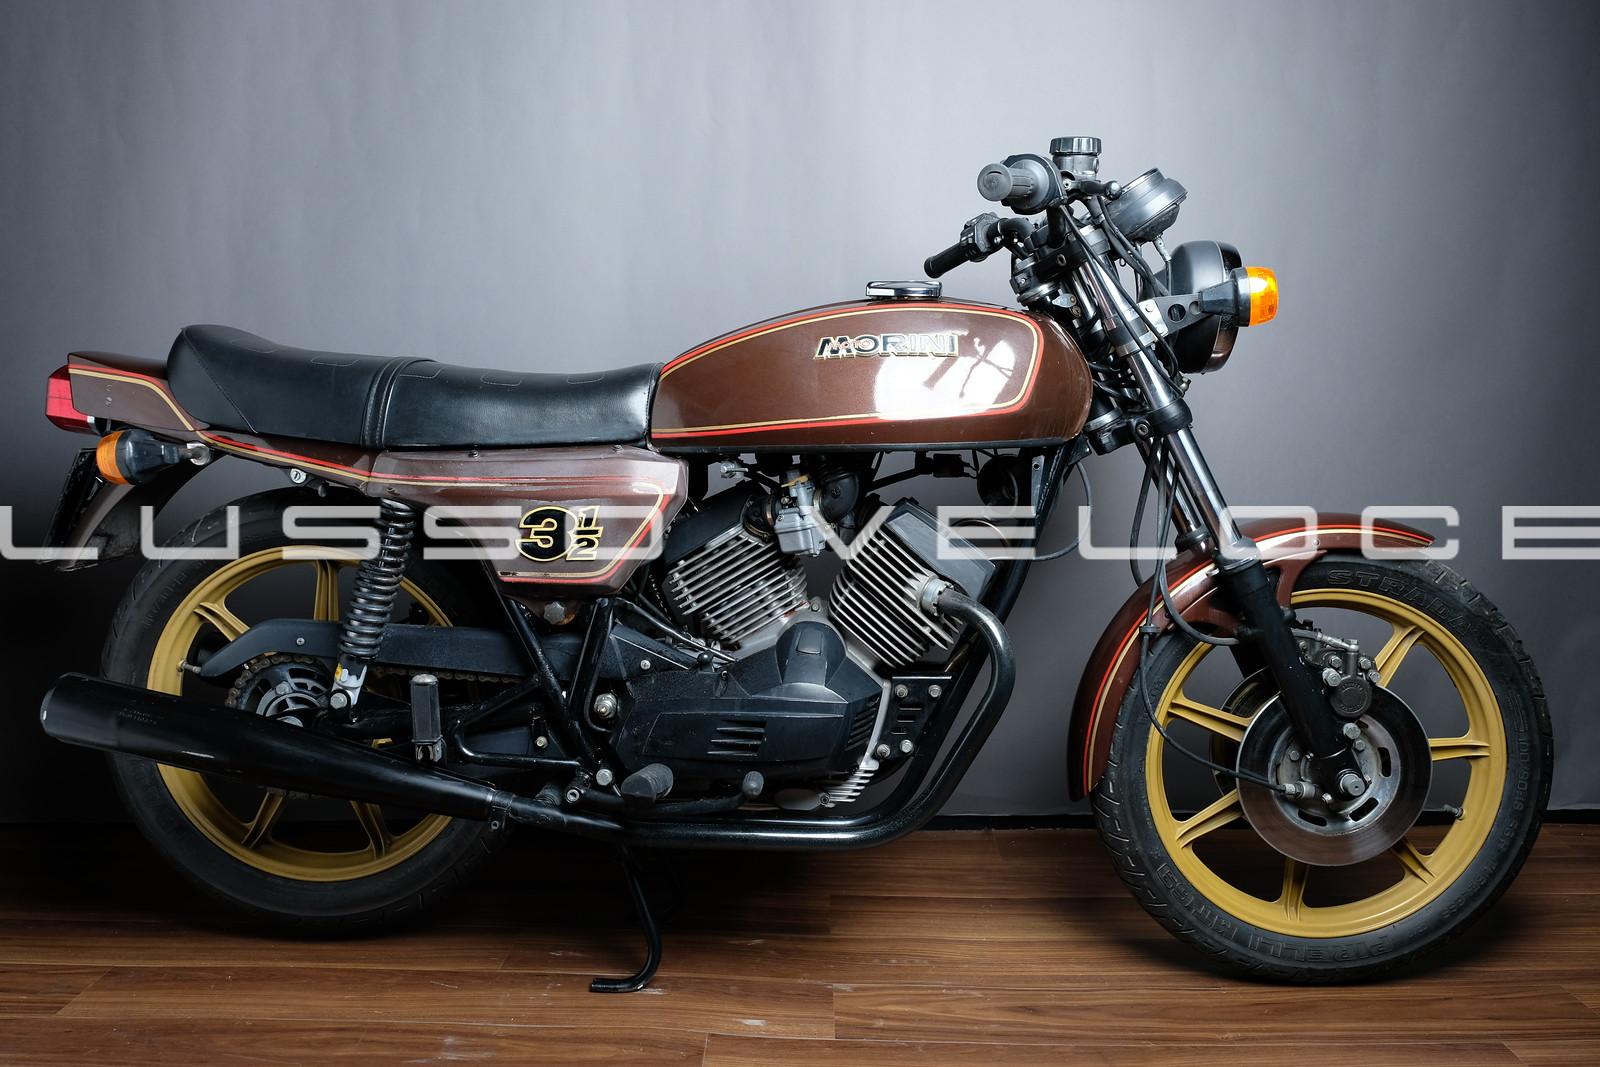 Moto Morini 350 Strada with Elec start